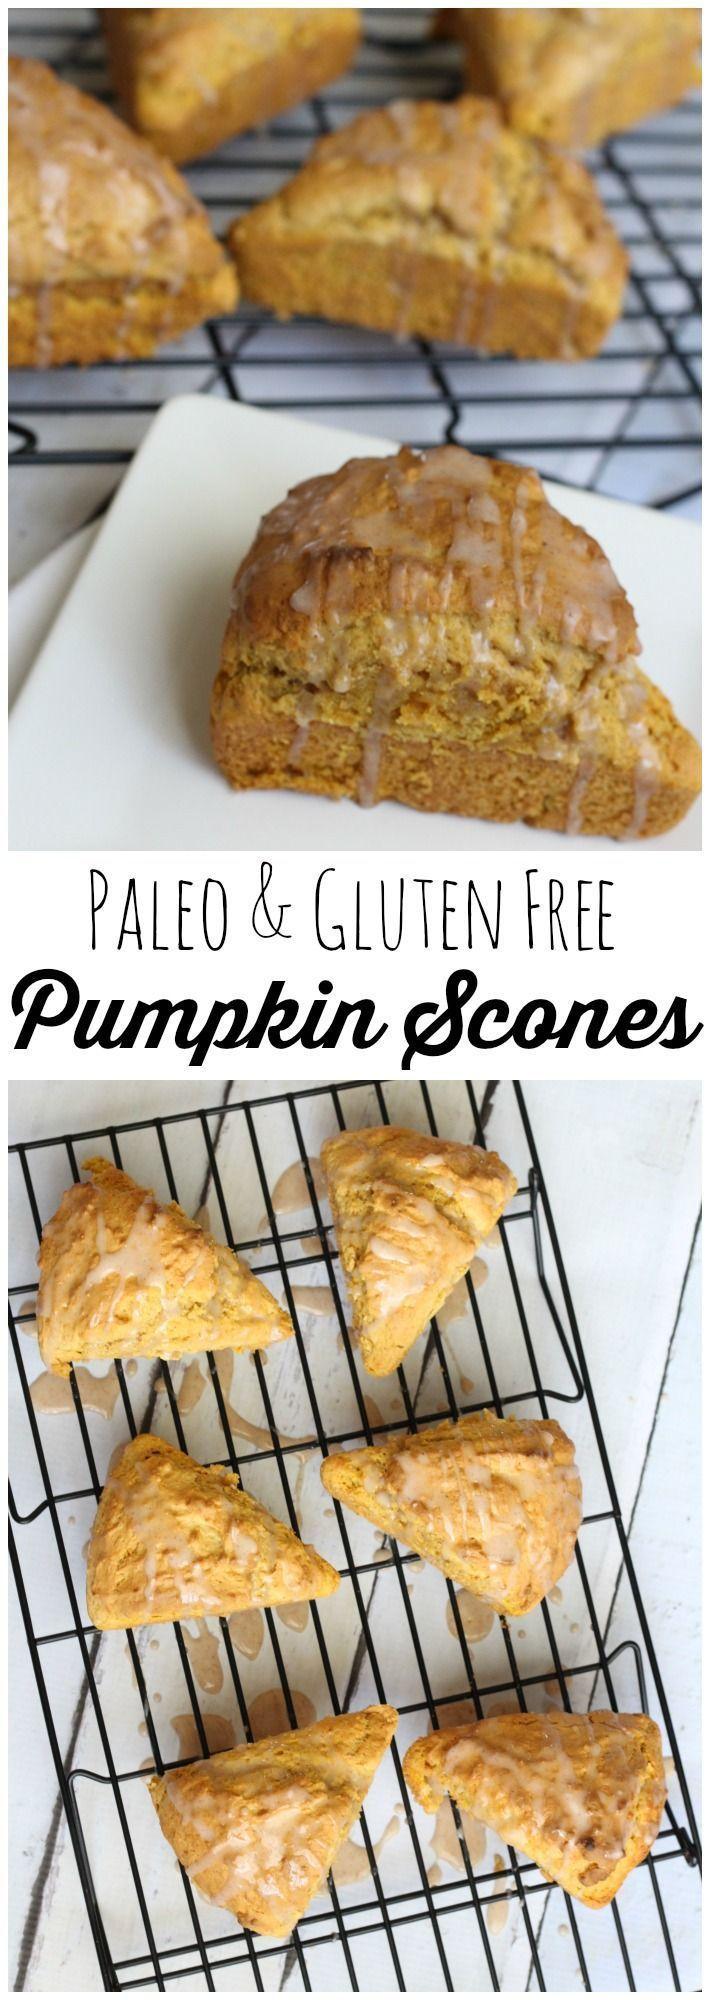 This paleo grain free pumpkin scone recipe is a family favorite. I also share…